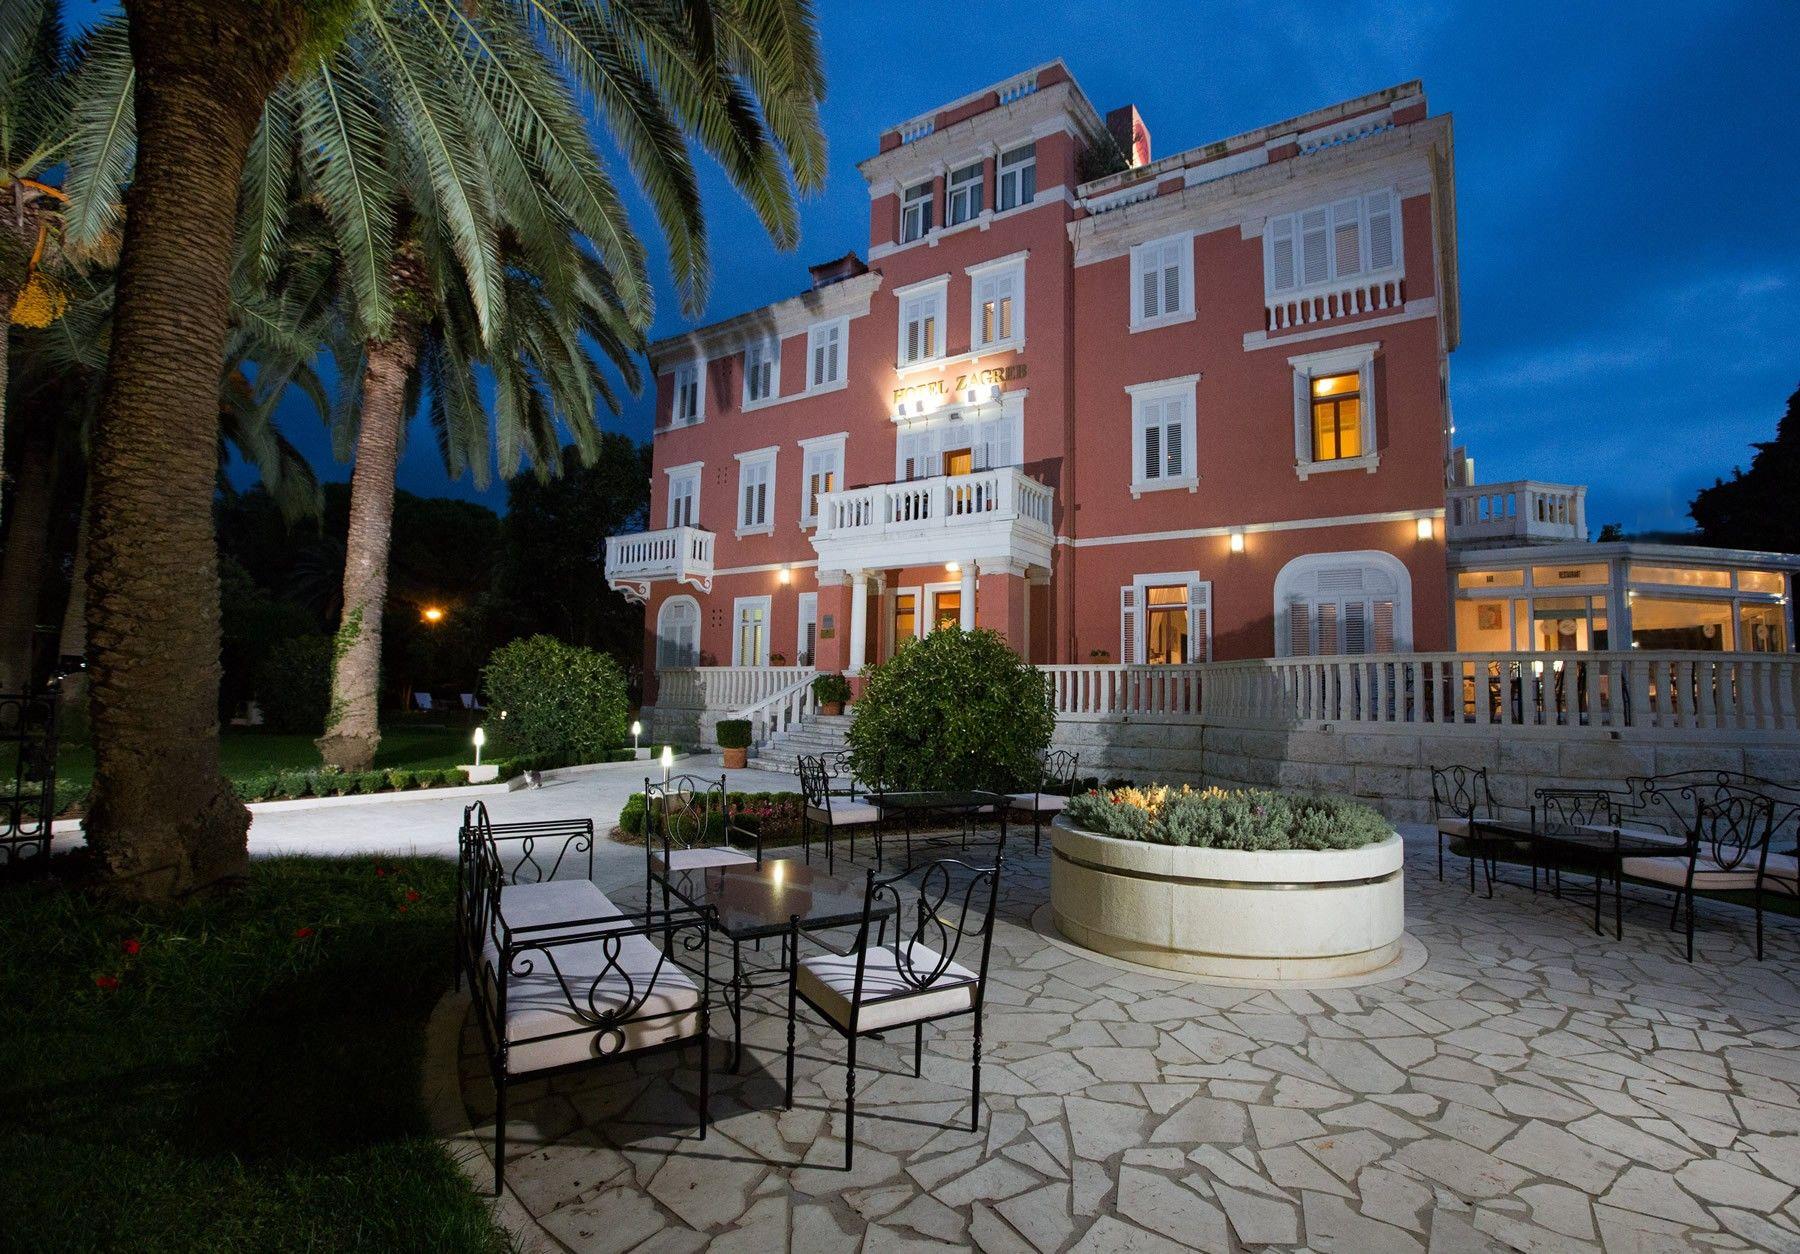 Hotel Zagreb Dubrovnik Hotel Accommodation Dubrovnik Ex Sumratin Hotels Hotel House Styles Dubrovnik